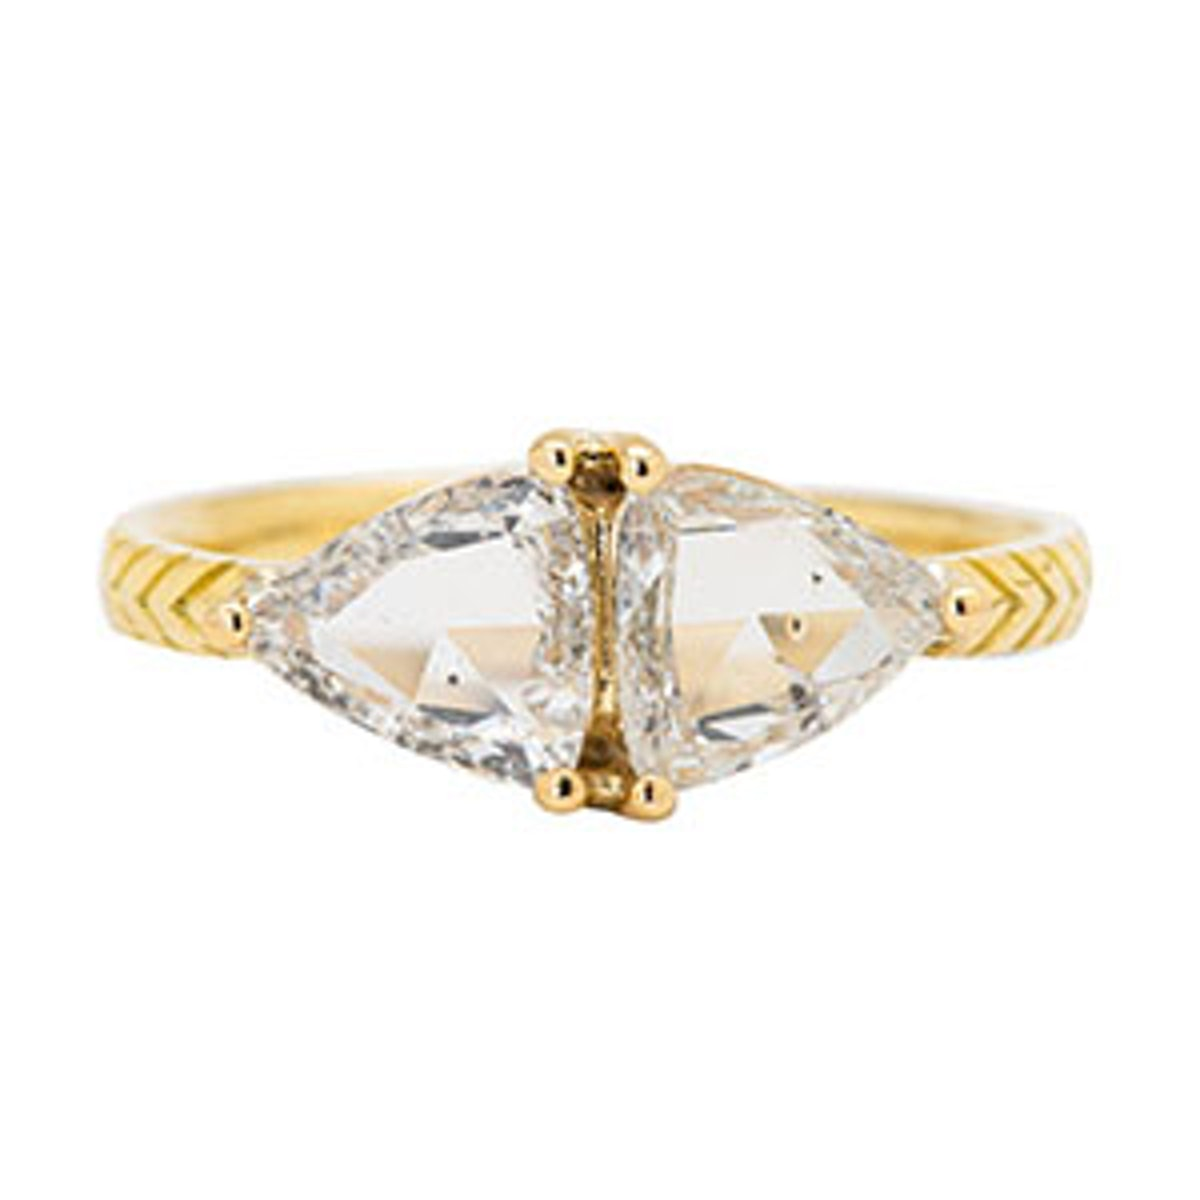 Salt & Pepper Kirk Diamond Ring in 18k Yellow Recycled Gold